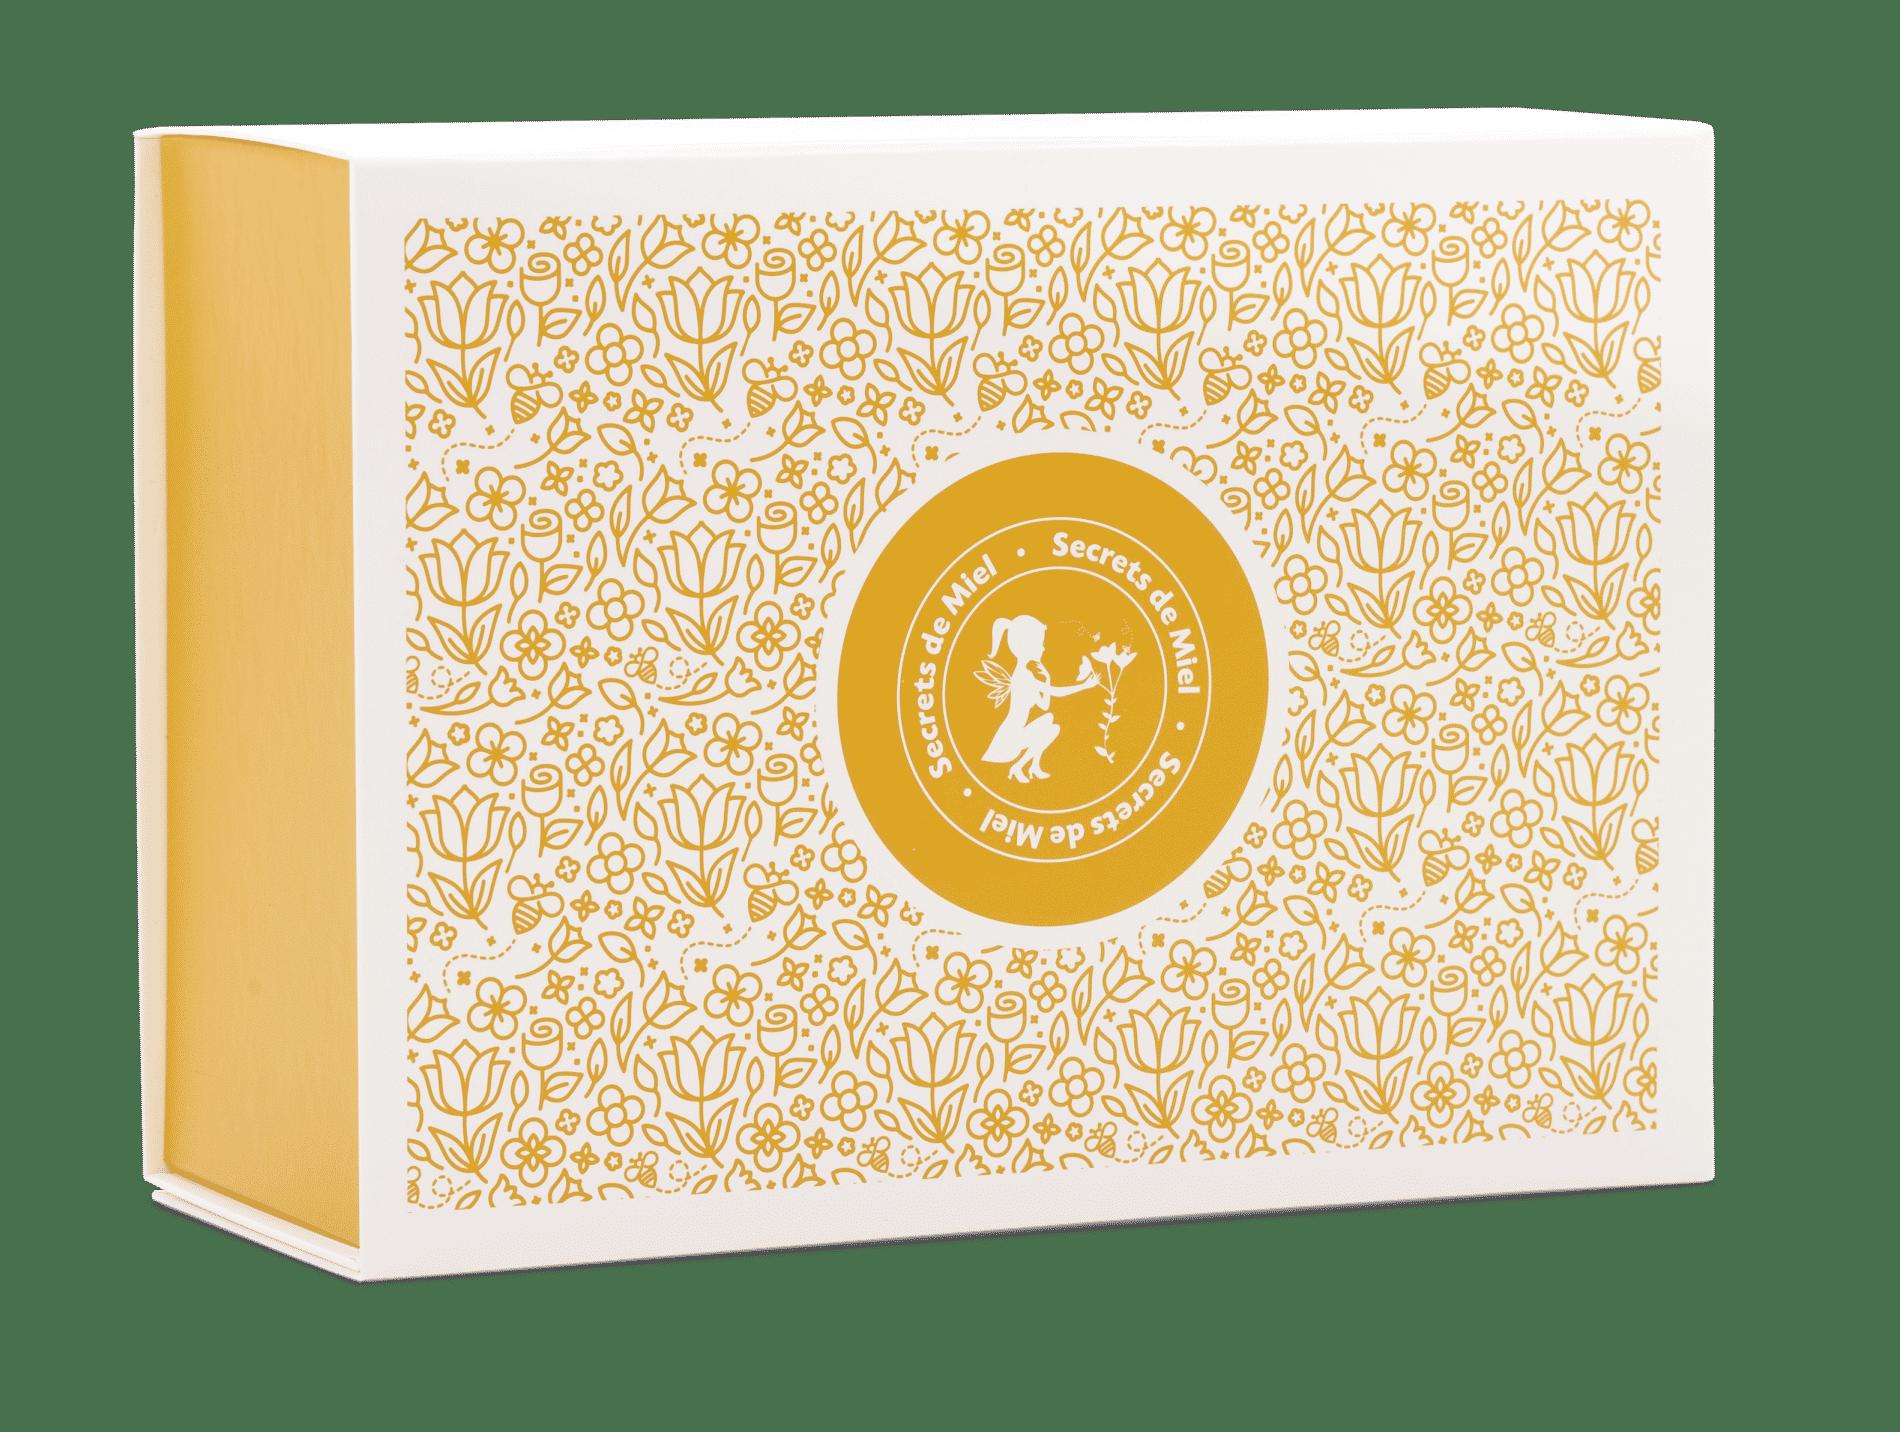 coffret cadeau - Secrets de Miel